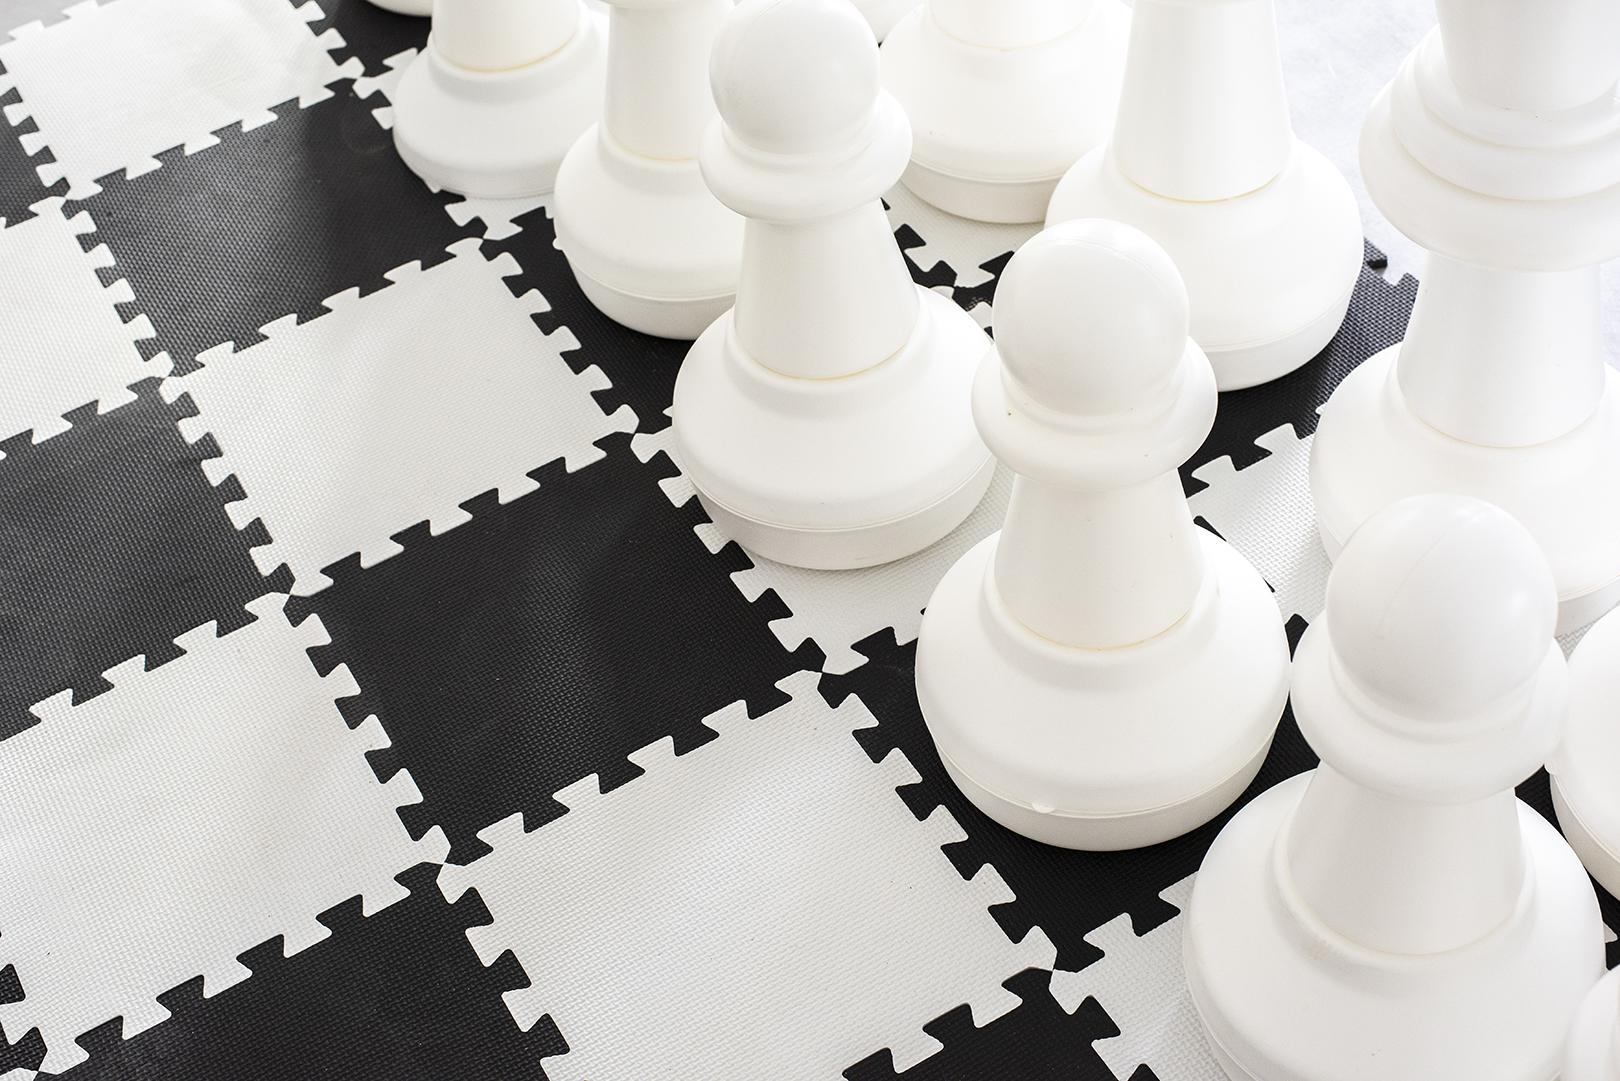 hacienda na xamena chessboard.jpg